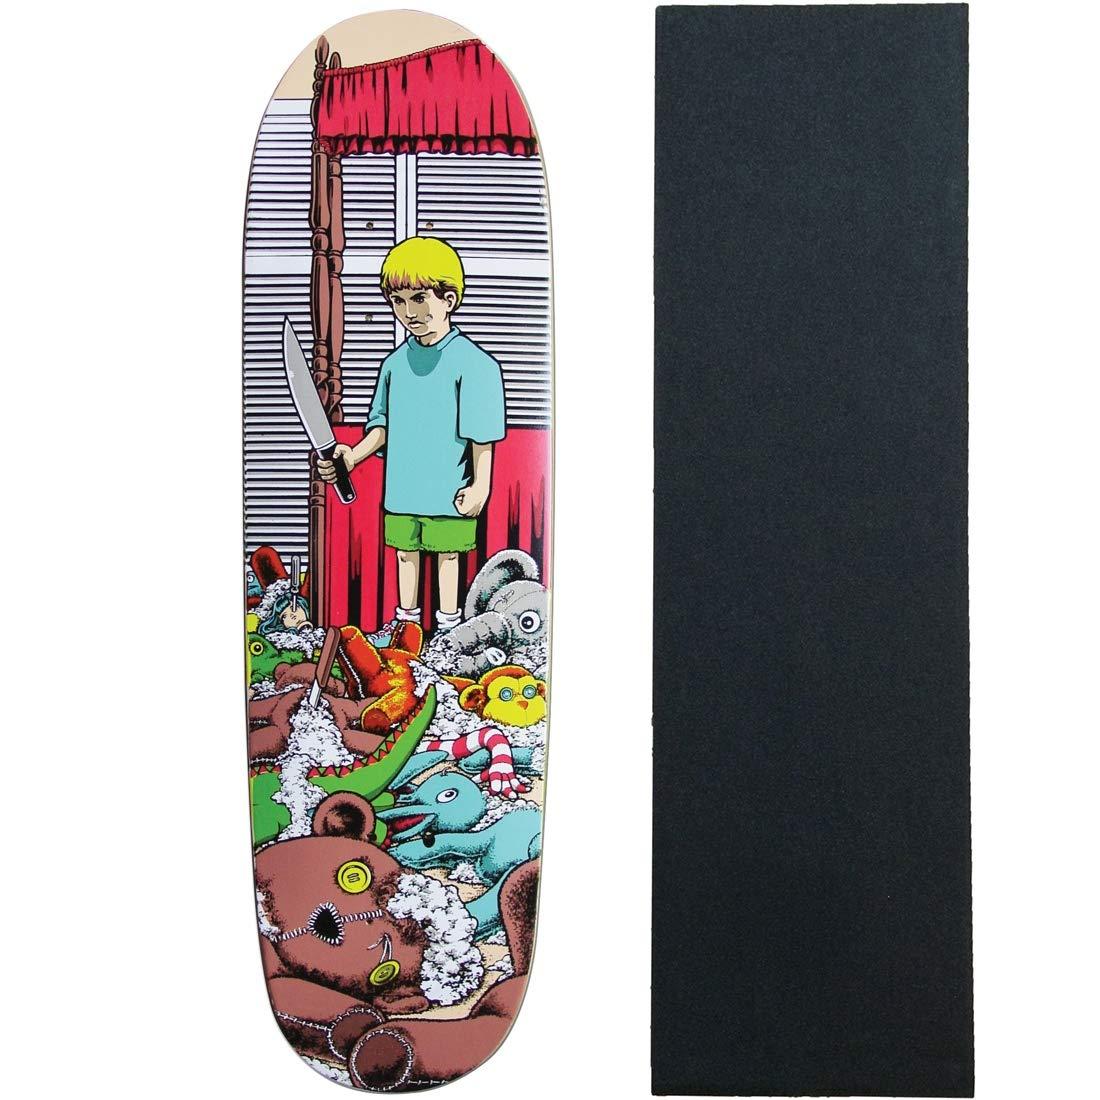 Heritage Re-Issue Skateboard Deck 101 McNatt Stuffed Animals with Grip